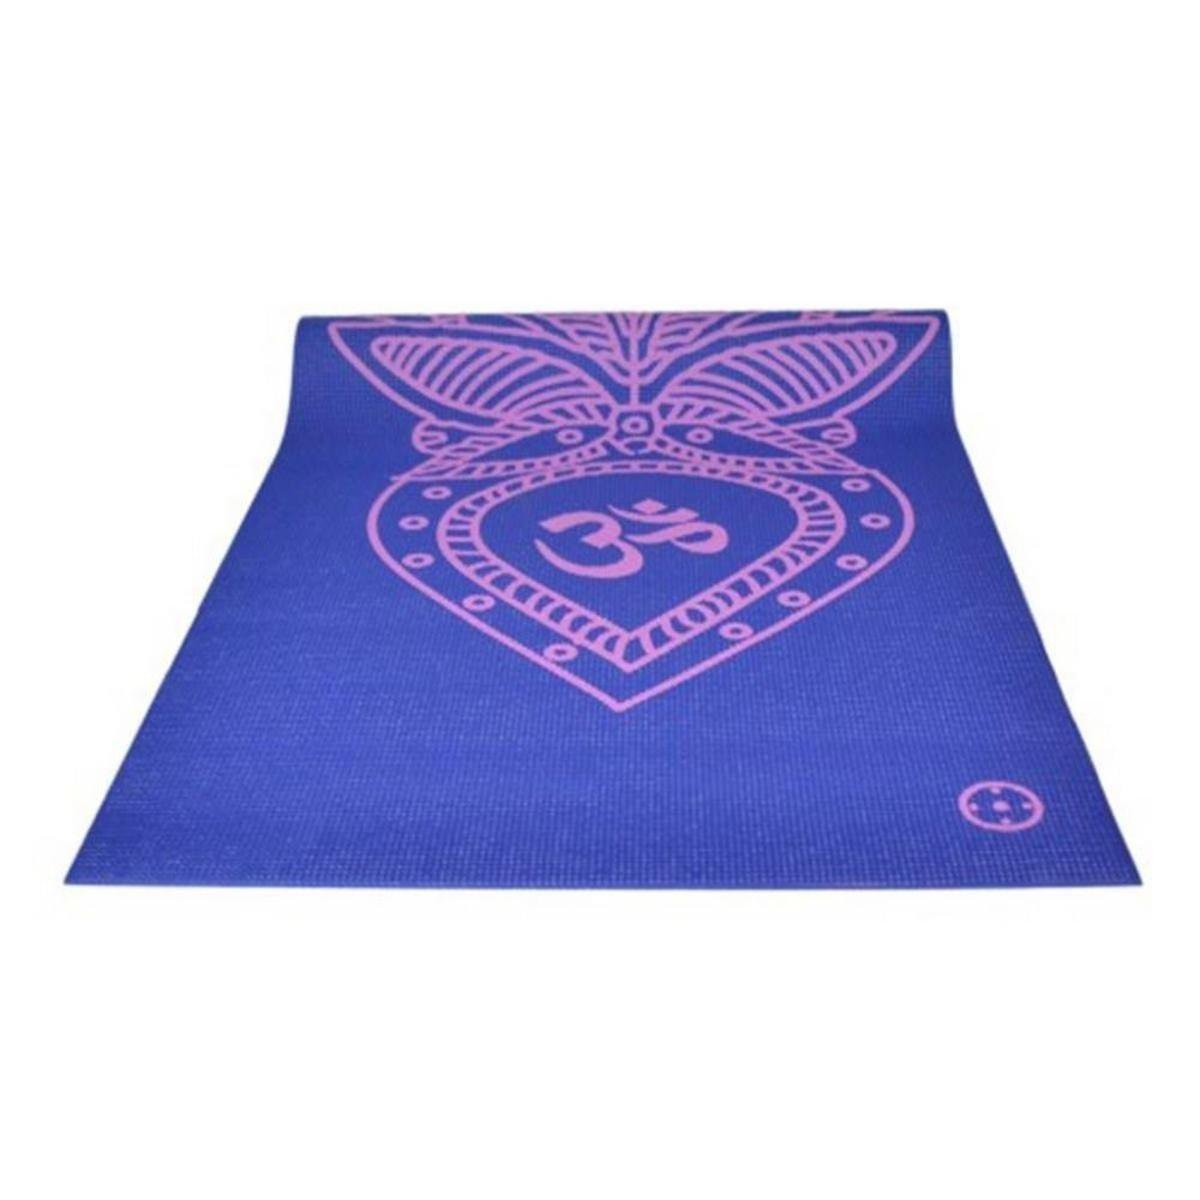 f1e714816 Tapete Yoga Mat em PVC ECO Lótus Hopumanu - Azul   Netshoes